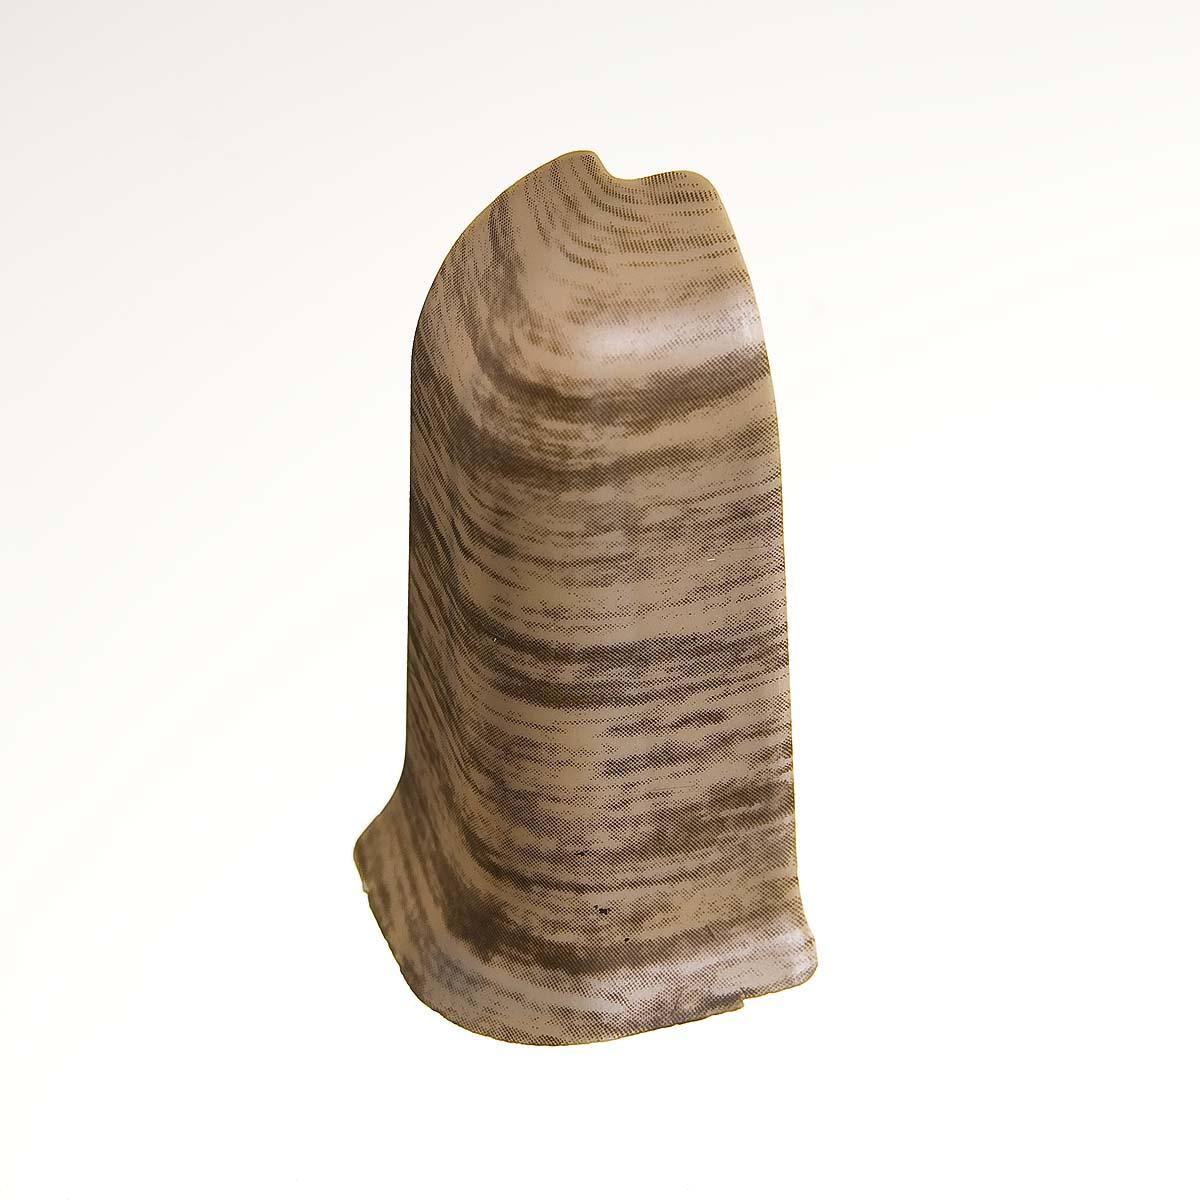 Угол наружный к плинтусу 68 мм королевский белый дуб Nexus